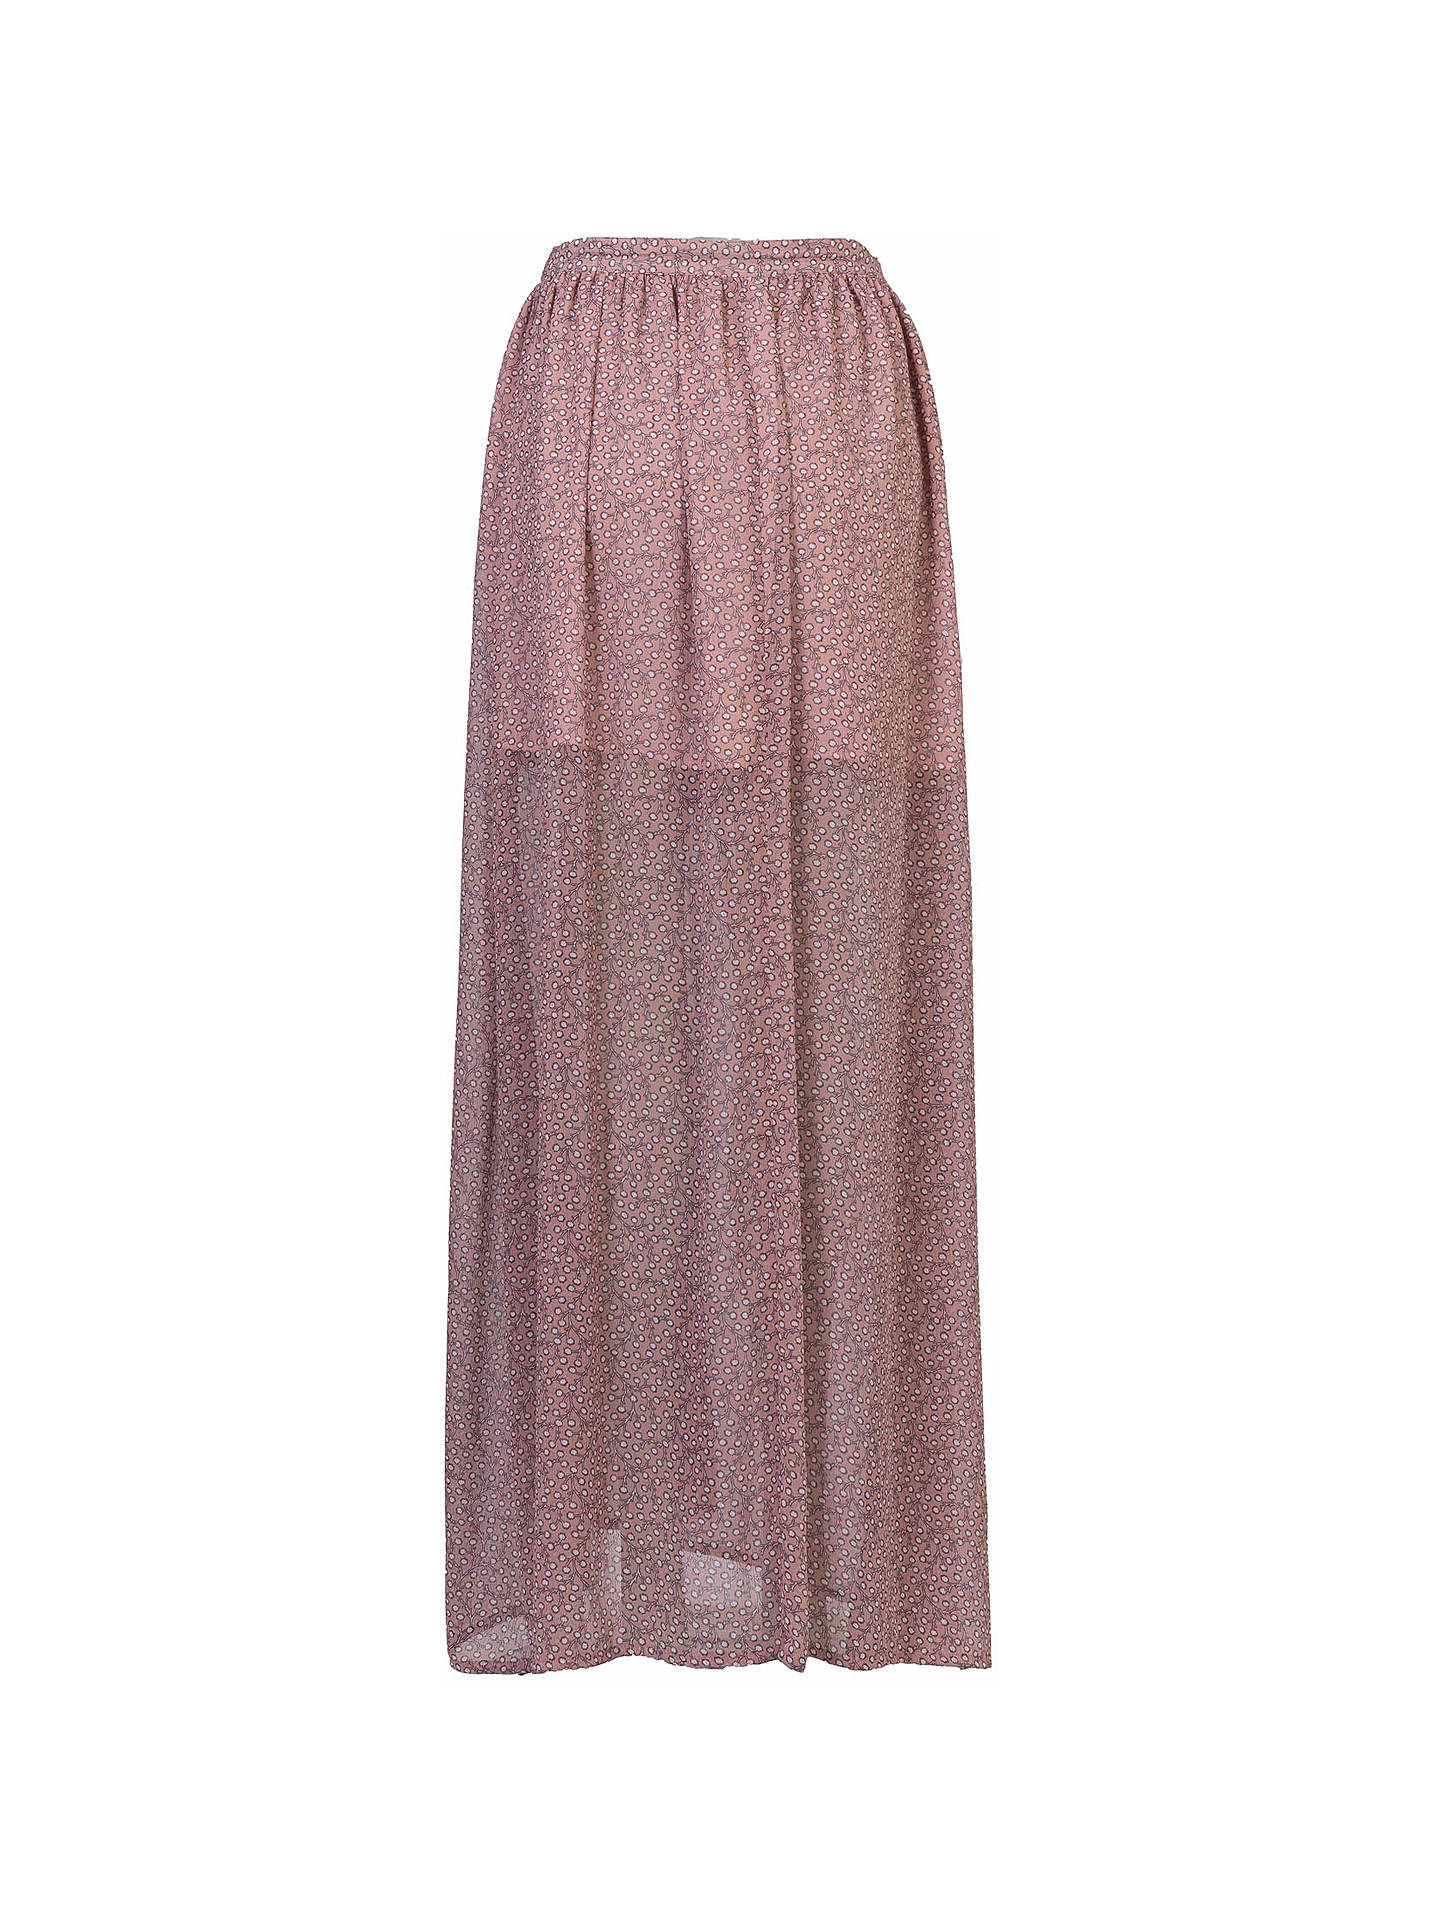 e555c4a0b493 Buy French Connection Elao Sheer Maxi Skirt